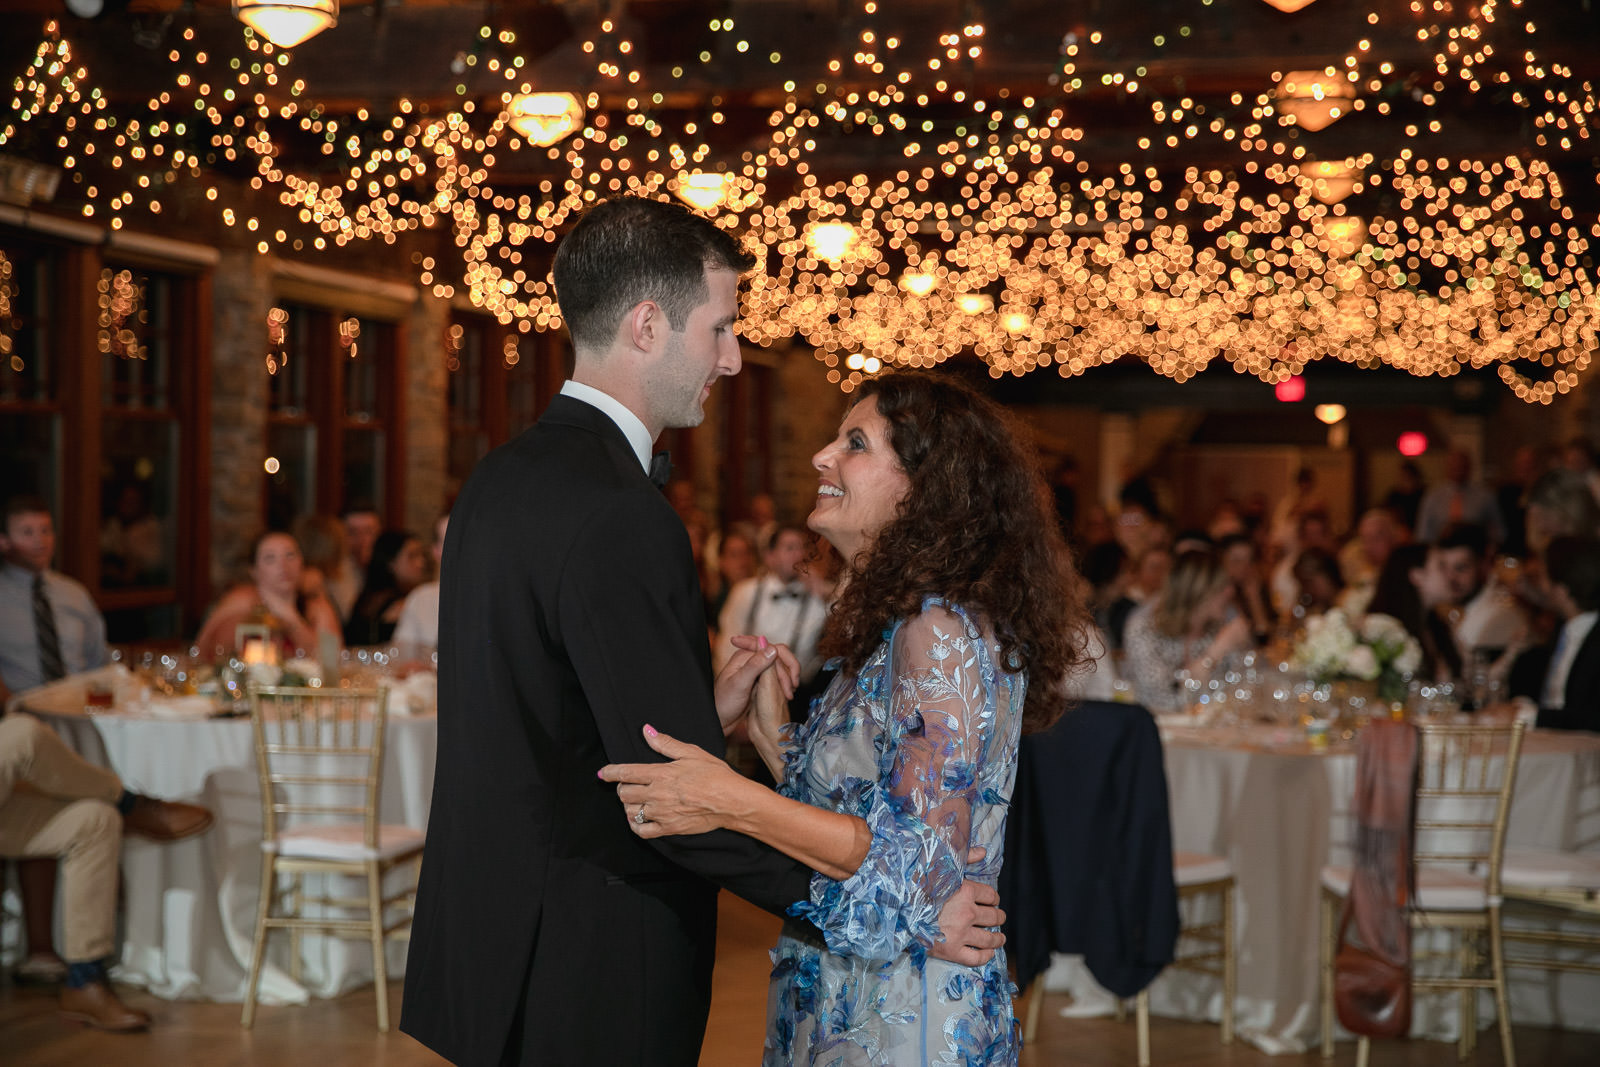 Wedding, Narragansett Towers, The Towers, Narragansett, Rhode Island, RI, Tracy Jenkins photography, RI wedding photographer, Rhode Island wedding photographer, mother son dance, wedding reception